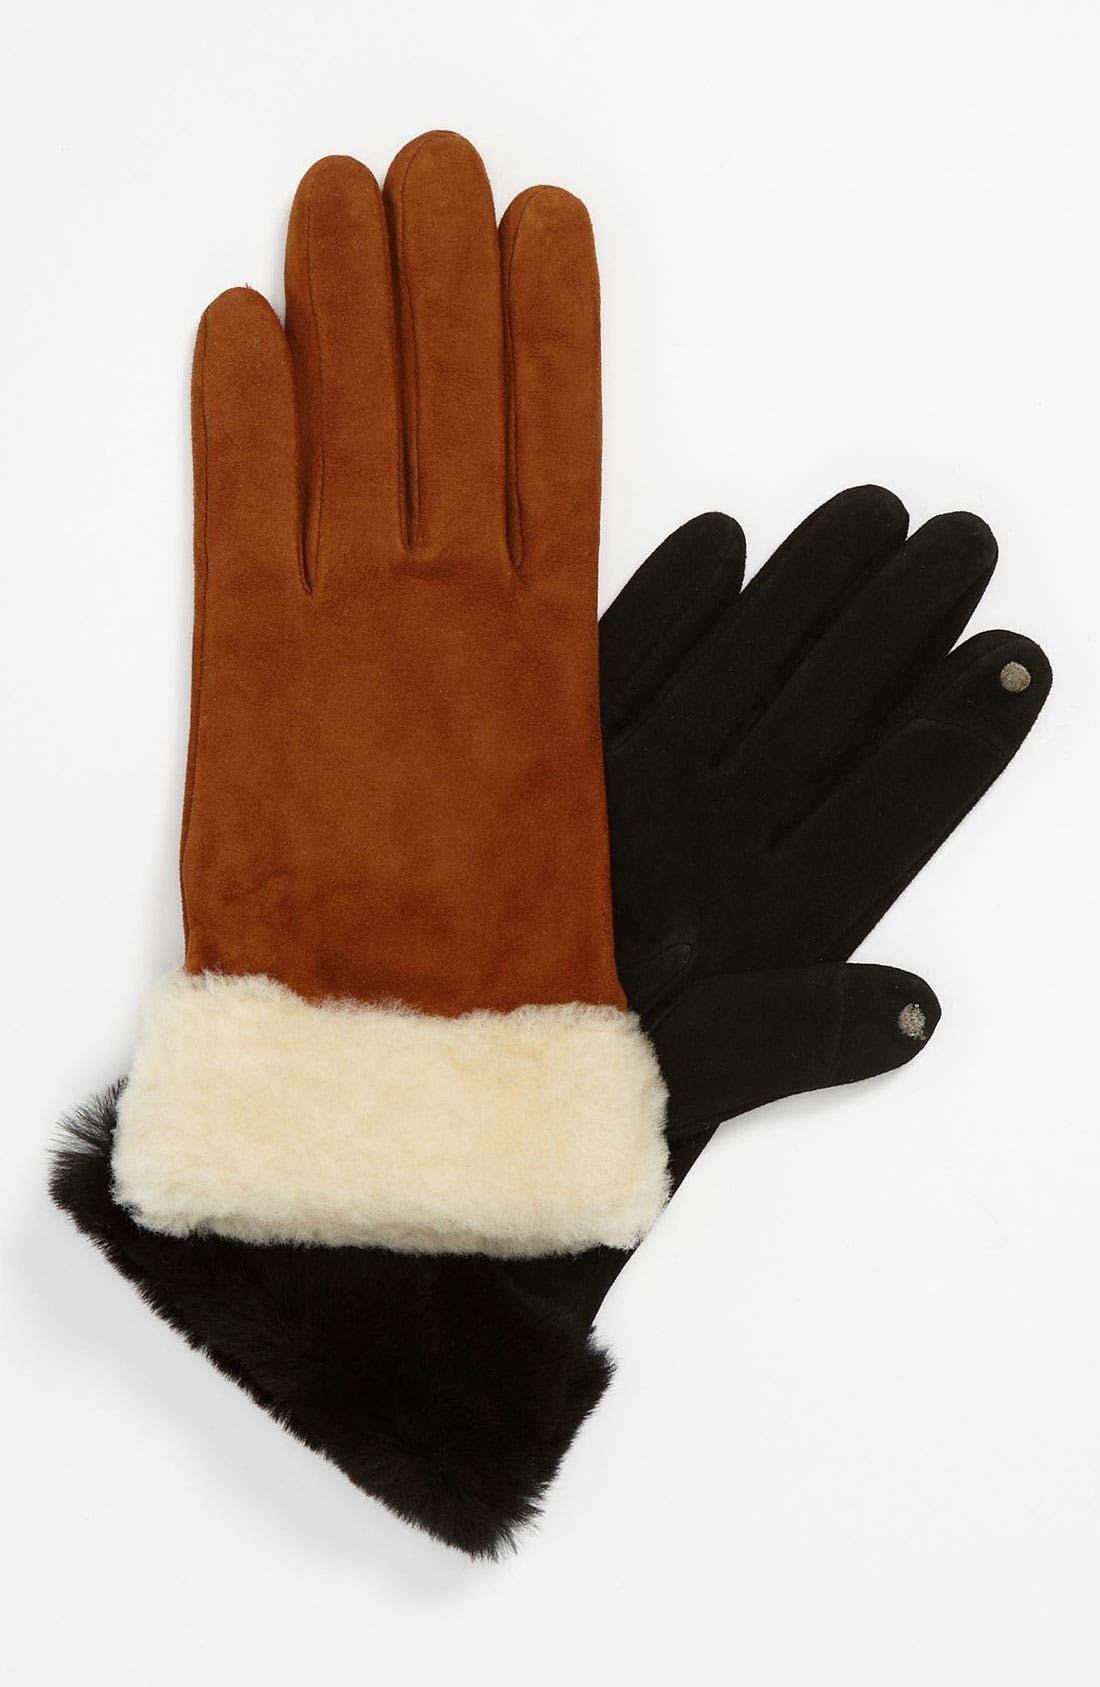 Alternate Image 1 Selected - UGG® Australia 'Kotah Shorty' Tech Gloves (Nordstrom Exclusive)